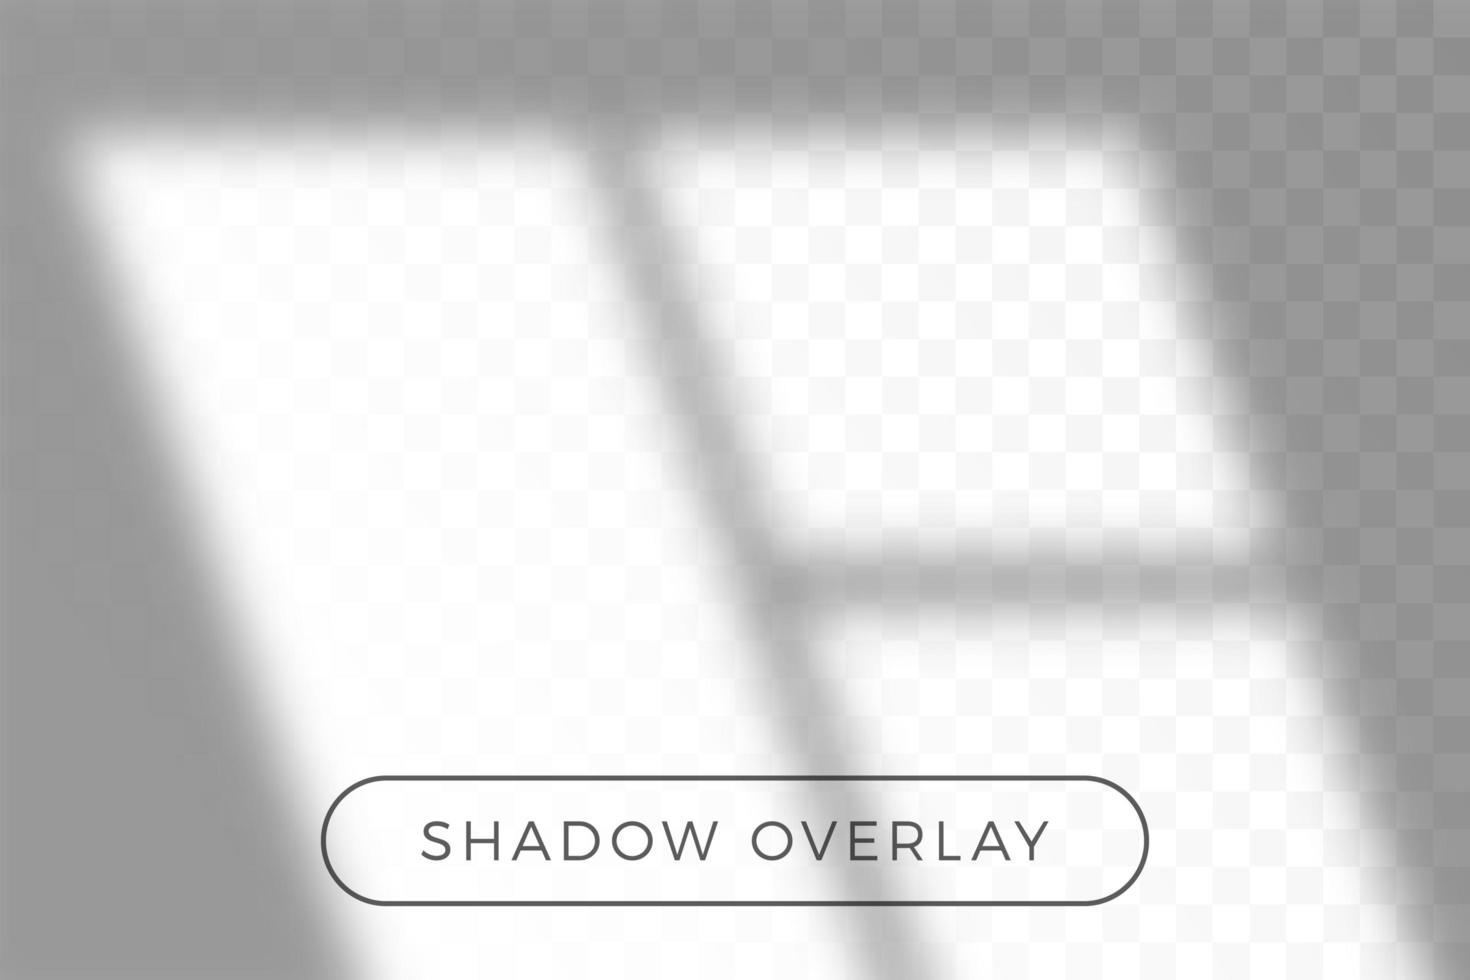 Overlay shadow of natural lighting vector